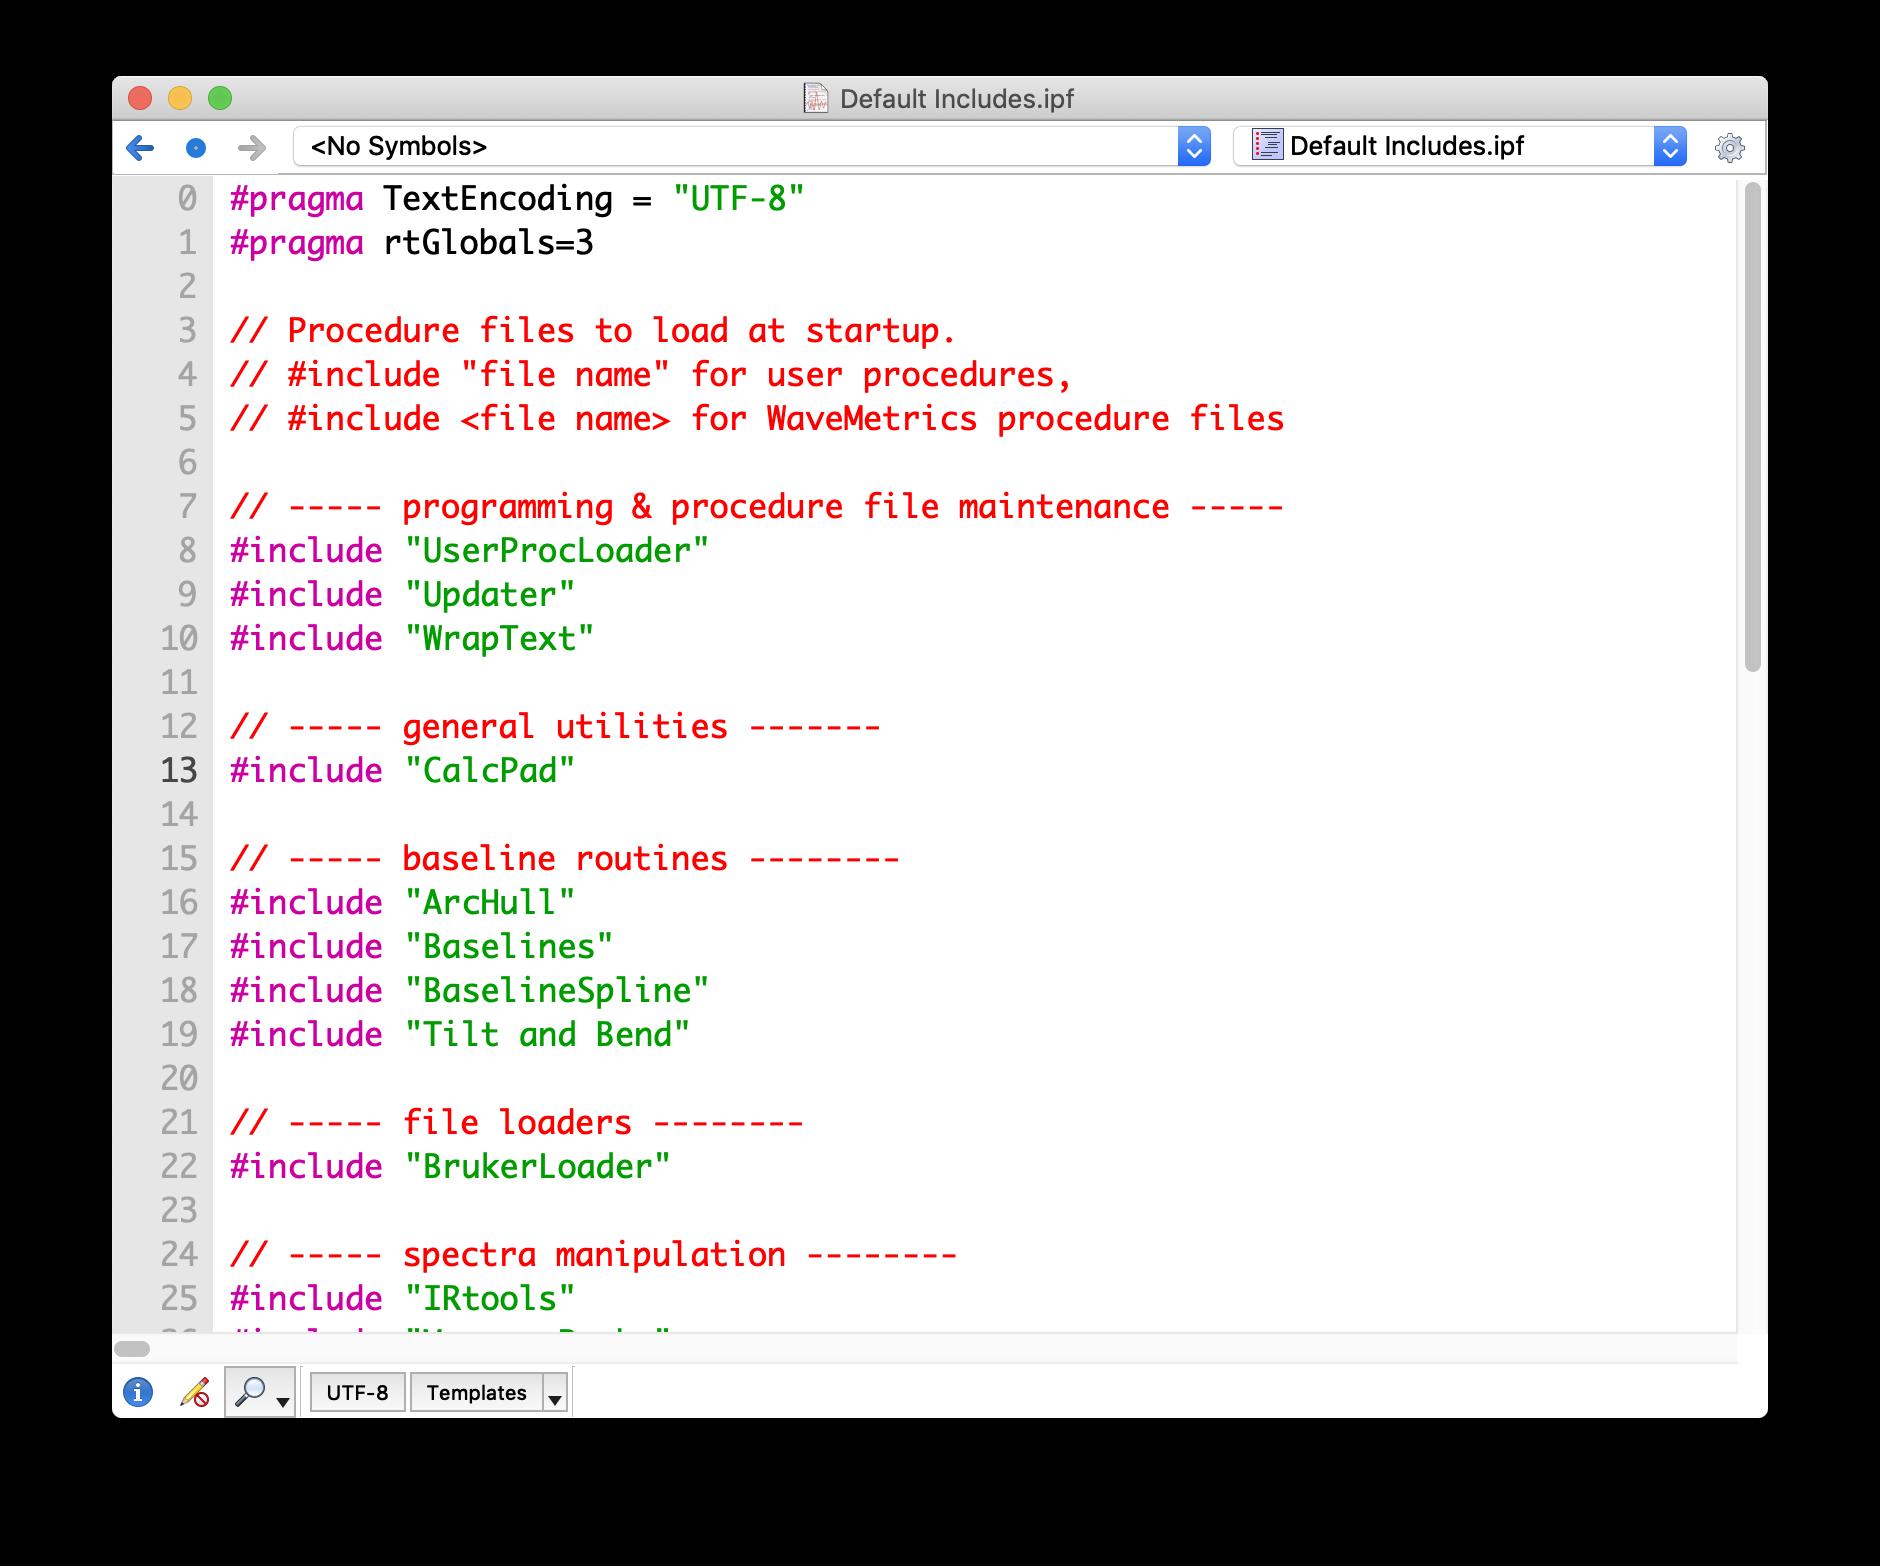 Default Includes screenshot